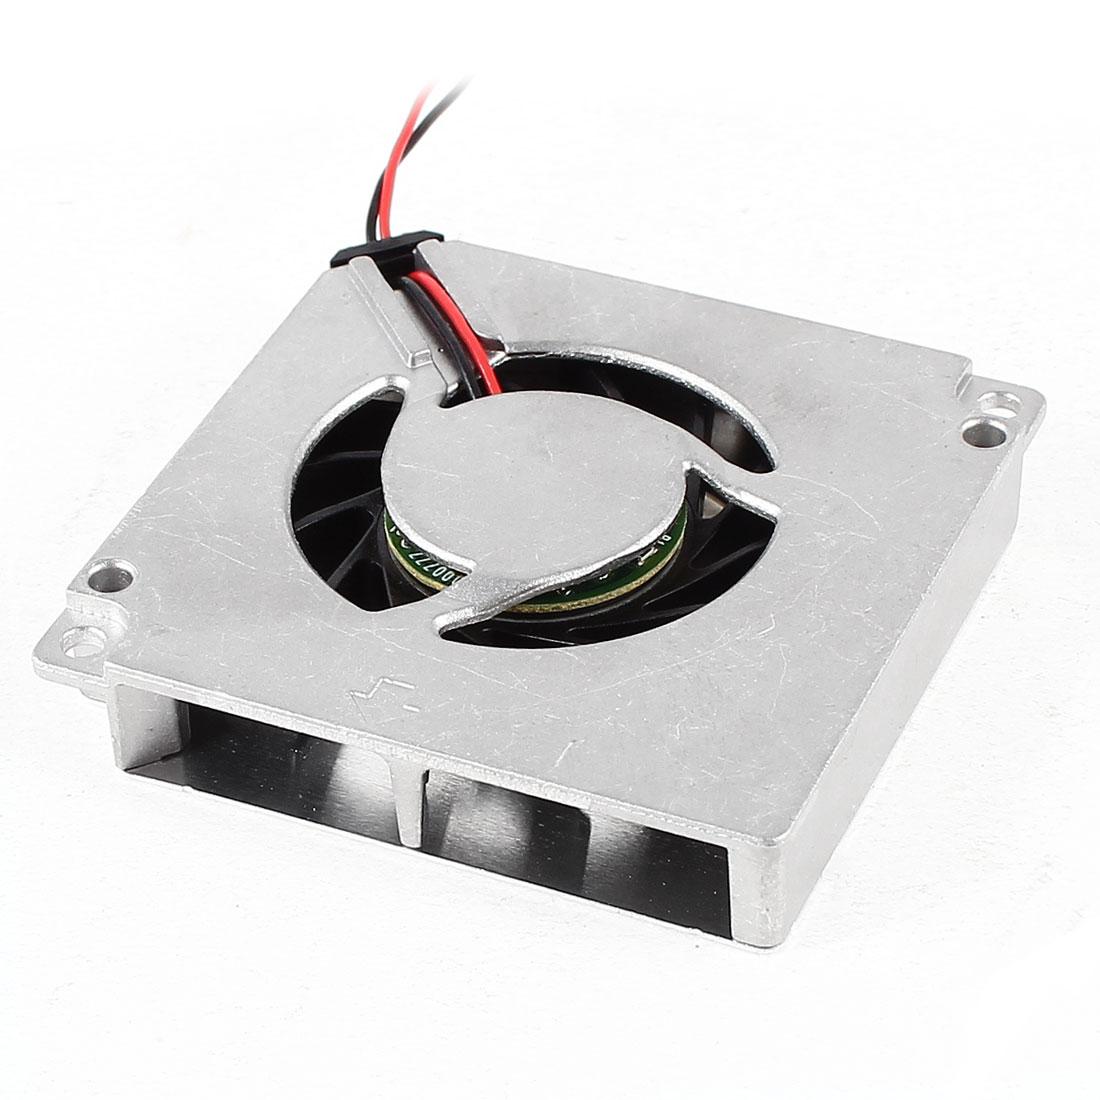 Black Silver Tone DC 5V 0.16A Aluminum Heat Sink Computer VGA Cooler Cooling Fan